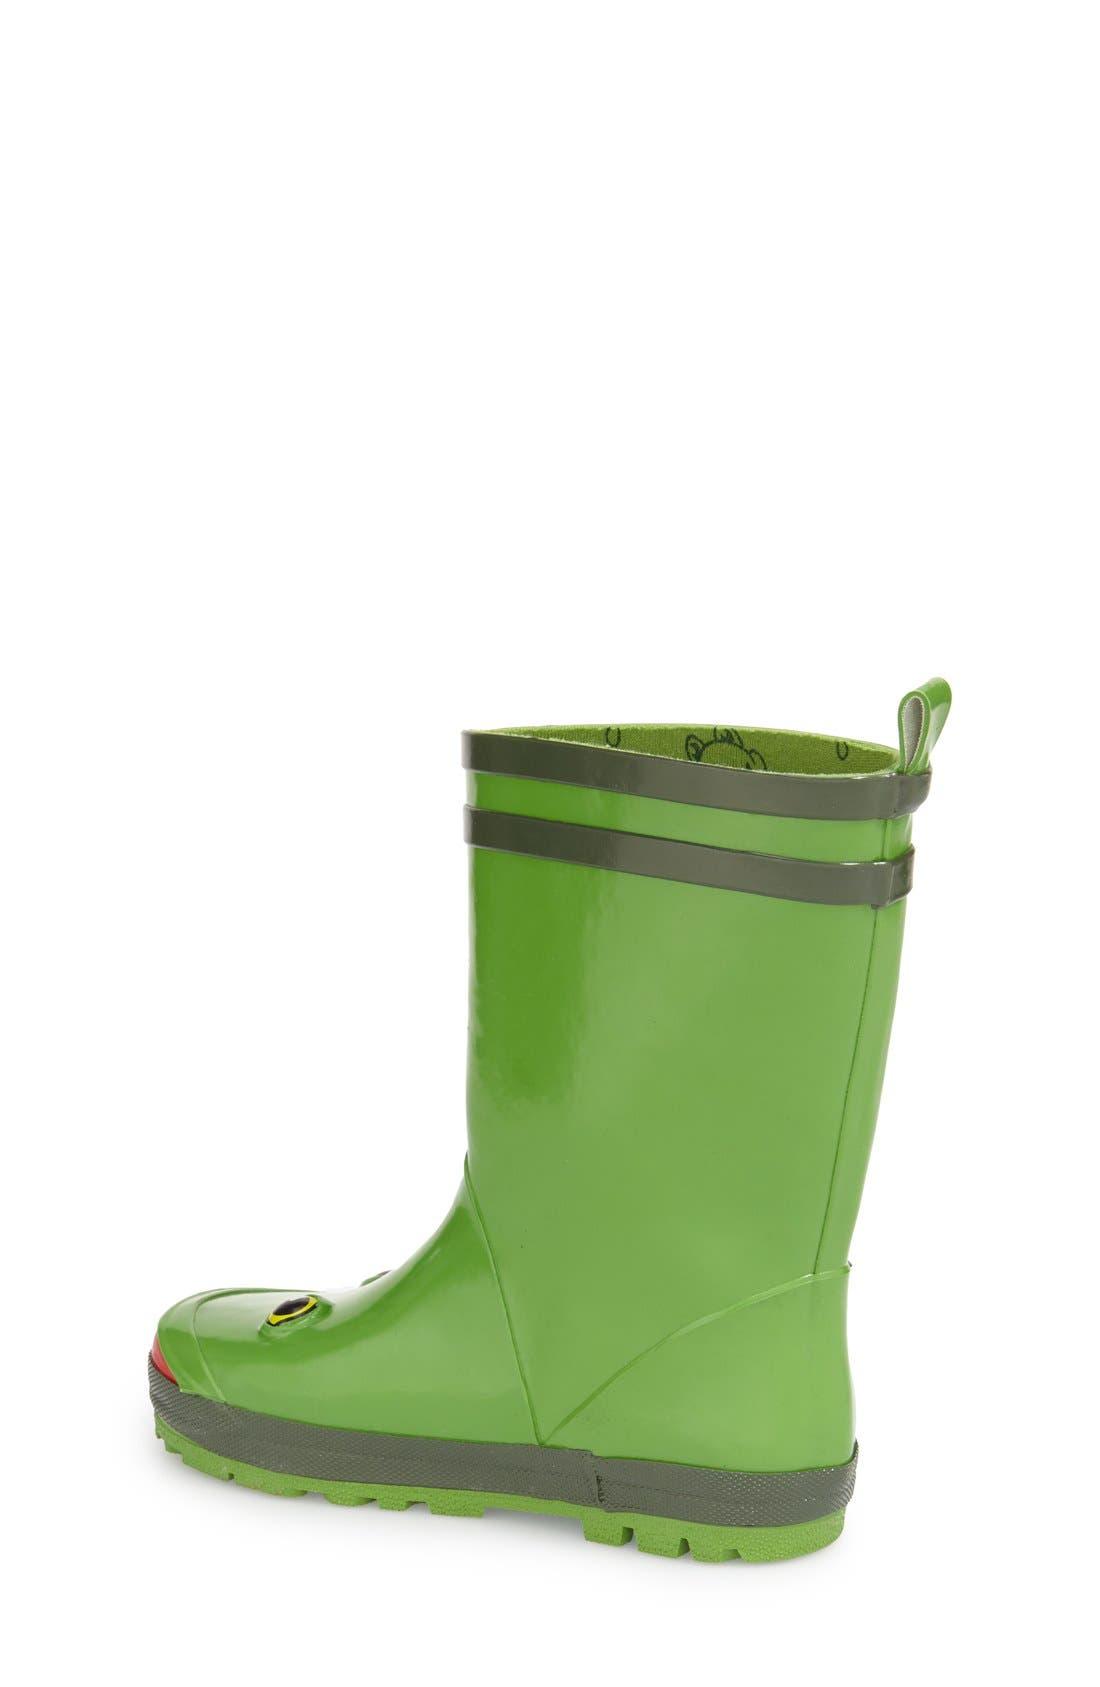 'Frog' Waterproof Rain Boot,                             Alternate thumbnail 2, color,                             Green